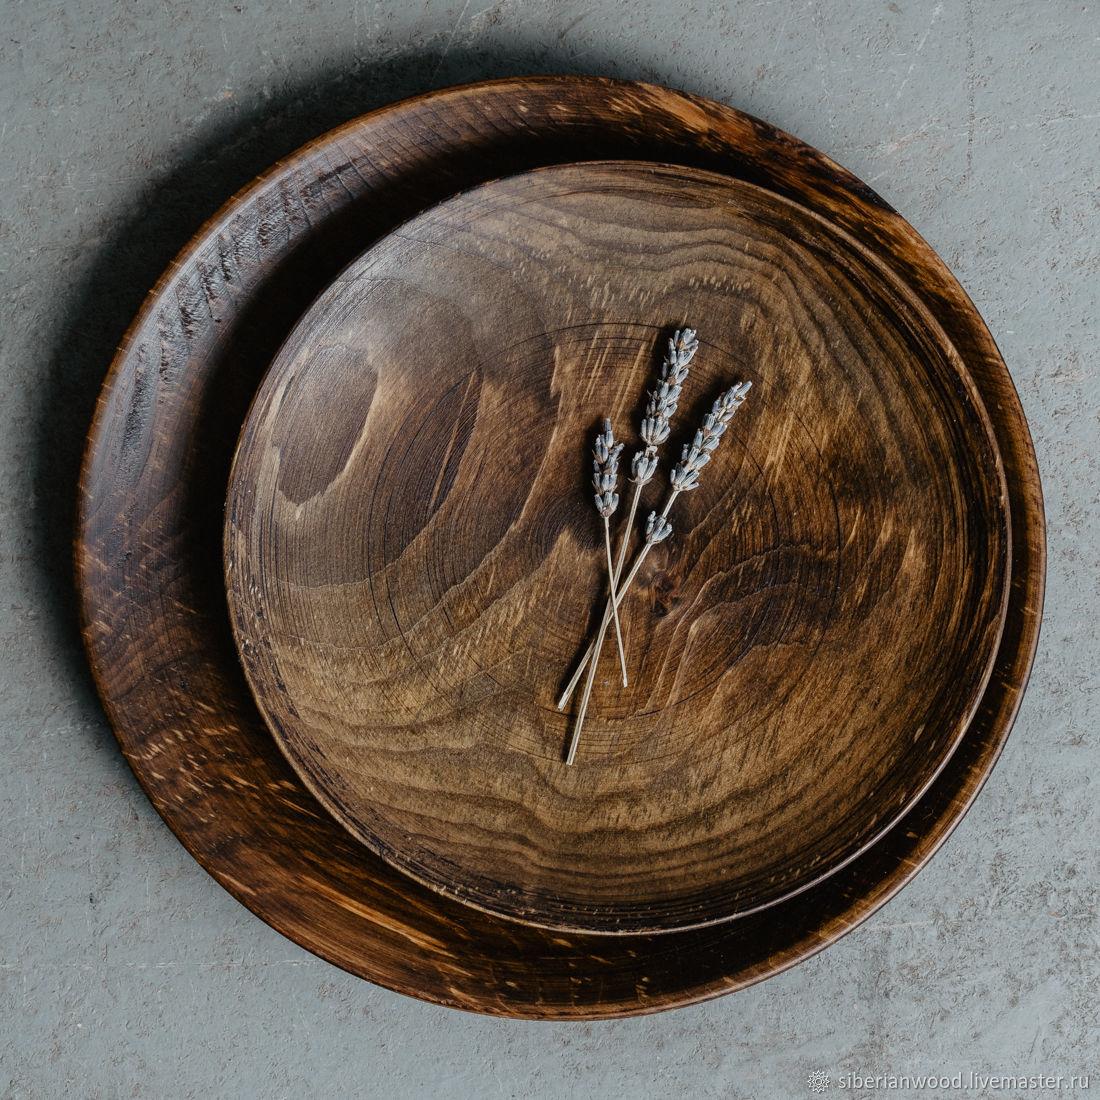 Set of Wooden Plates 2 PCs 100%#42, Plates, Novokuznetsk,  Фото №1